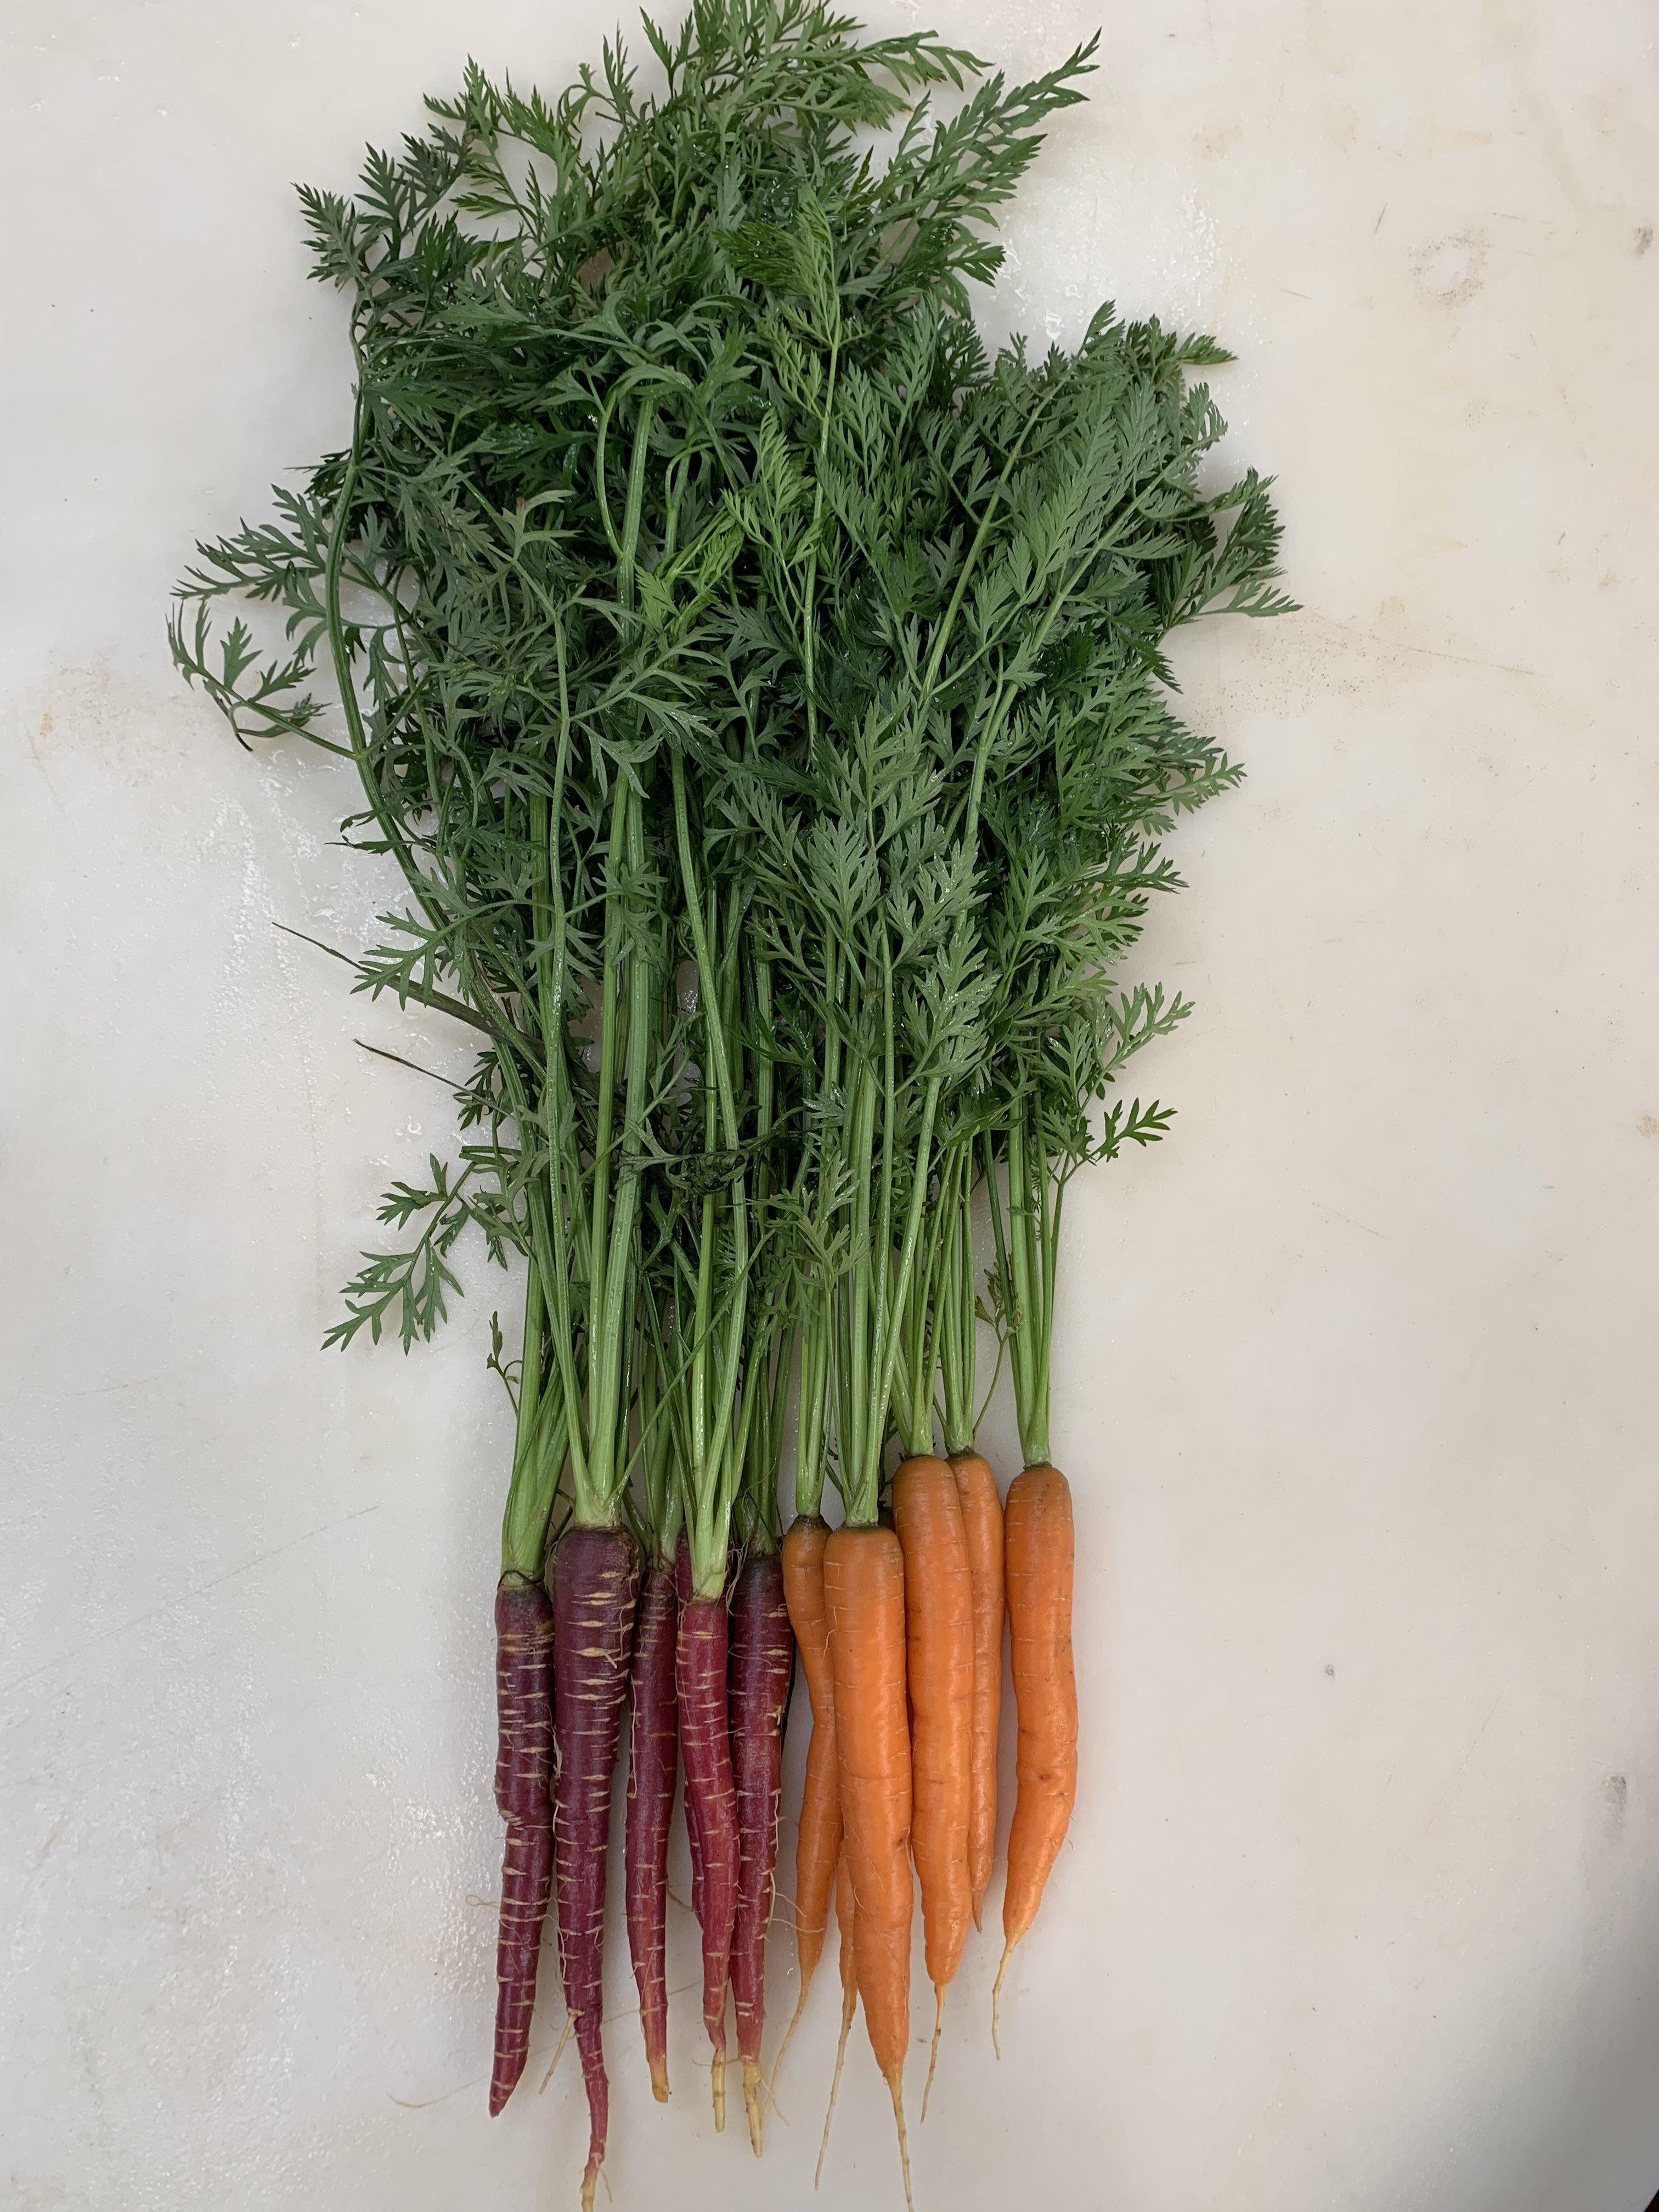 Farm Happenings for July 1, 2019